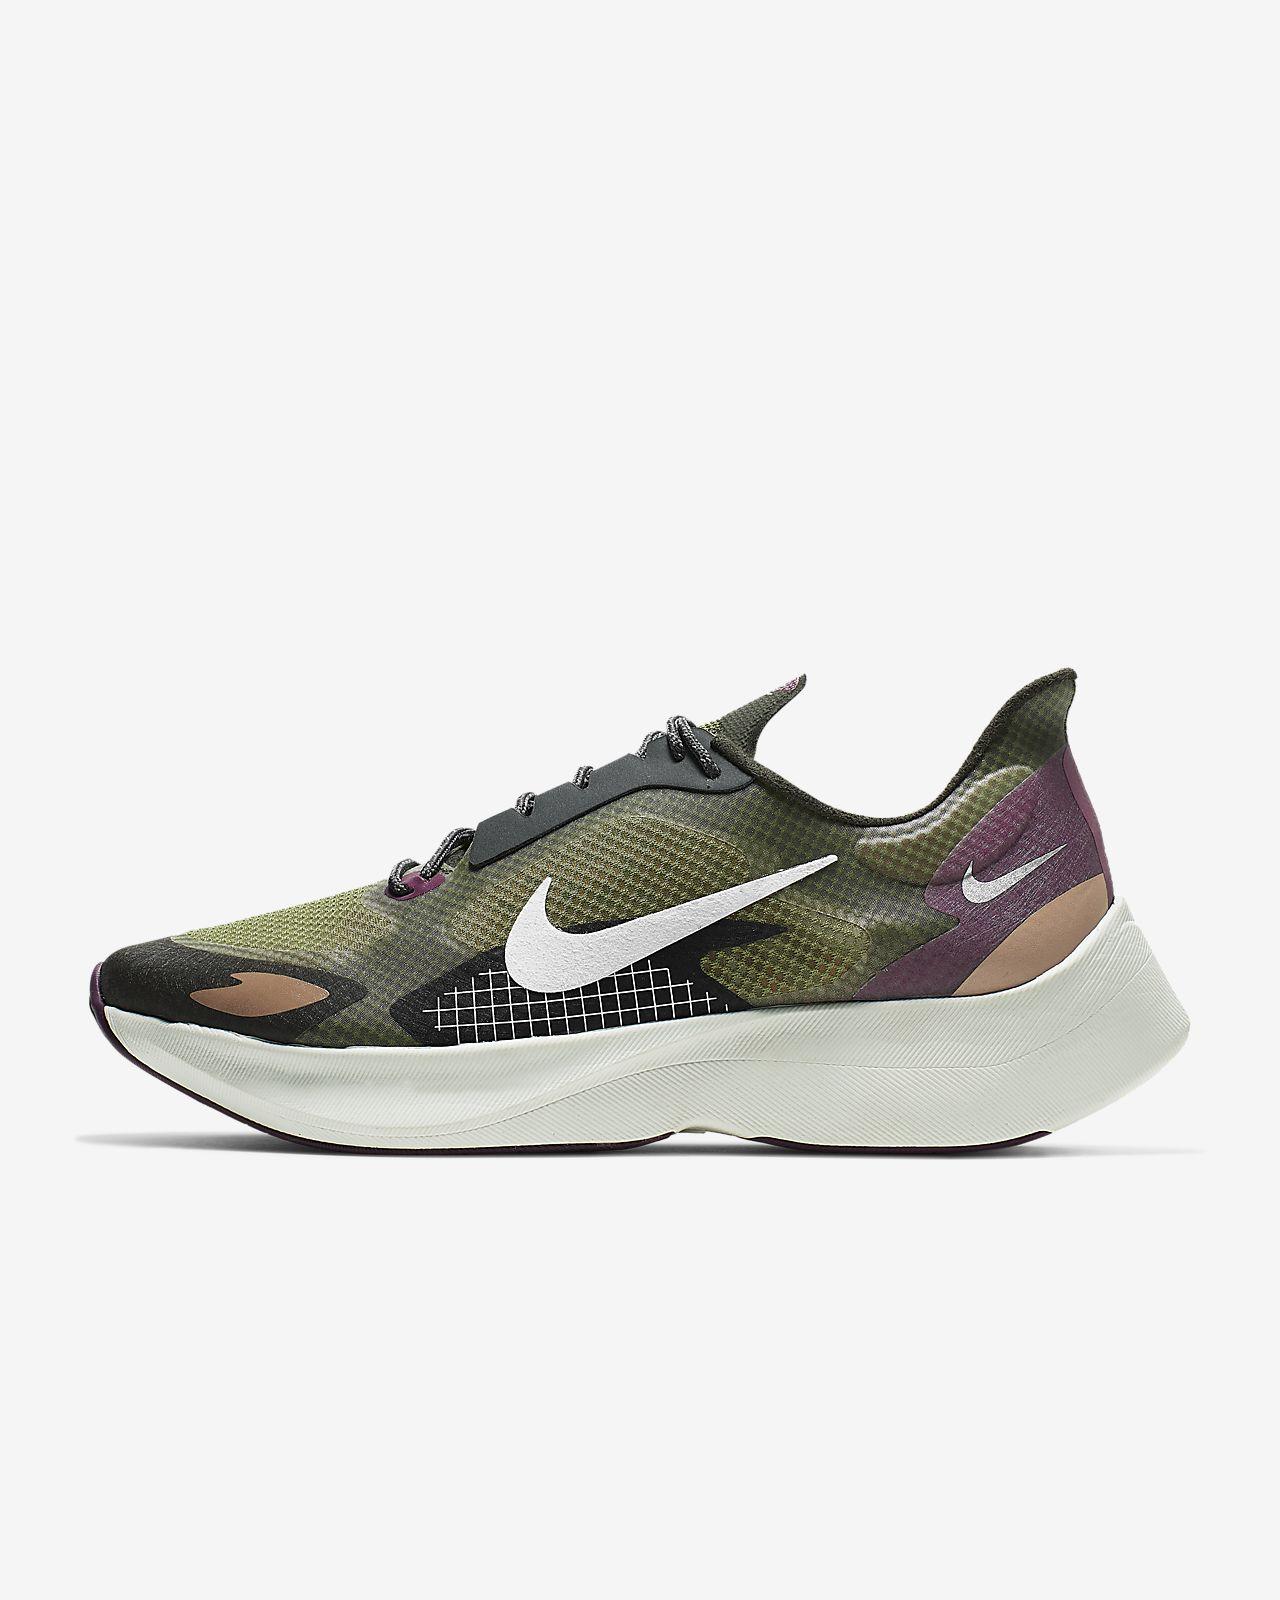 Men Shoes Nike Air Huarache Camouflage Sneakers [nike 389